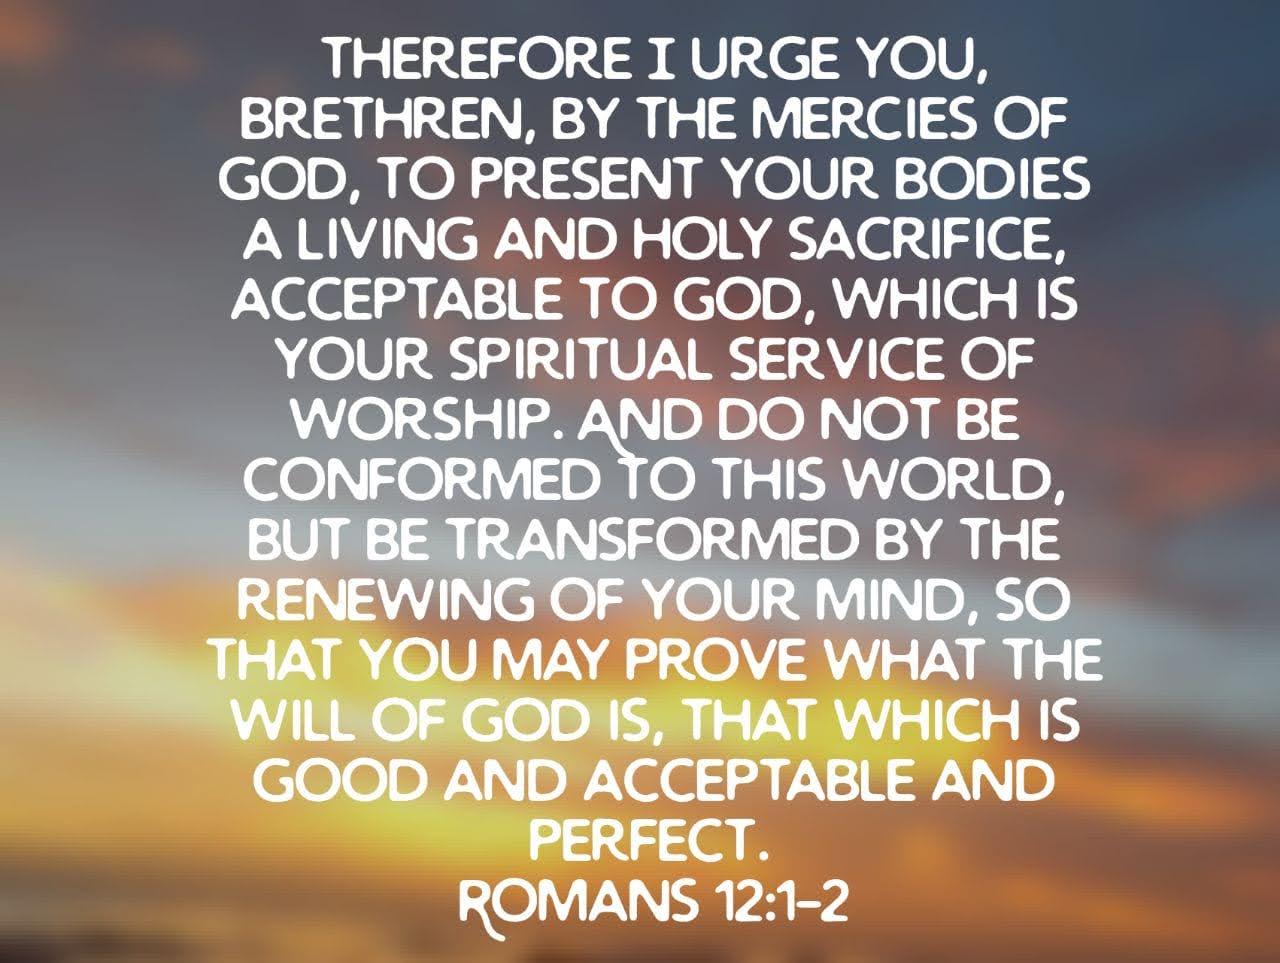 Sacrifice, Worship, and Transformation